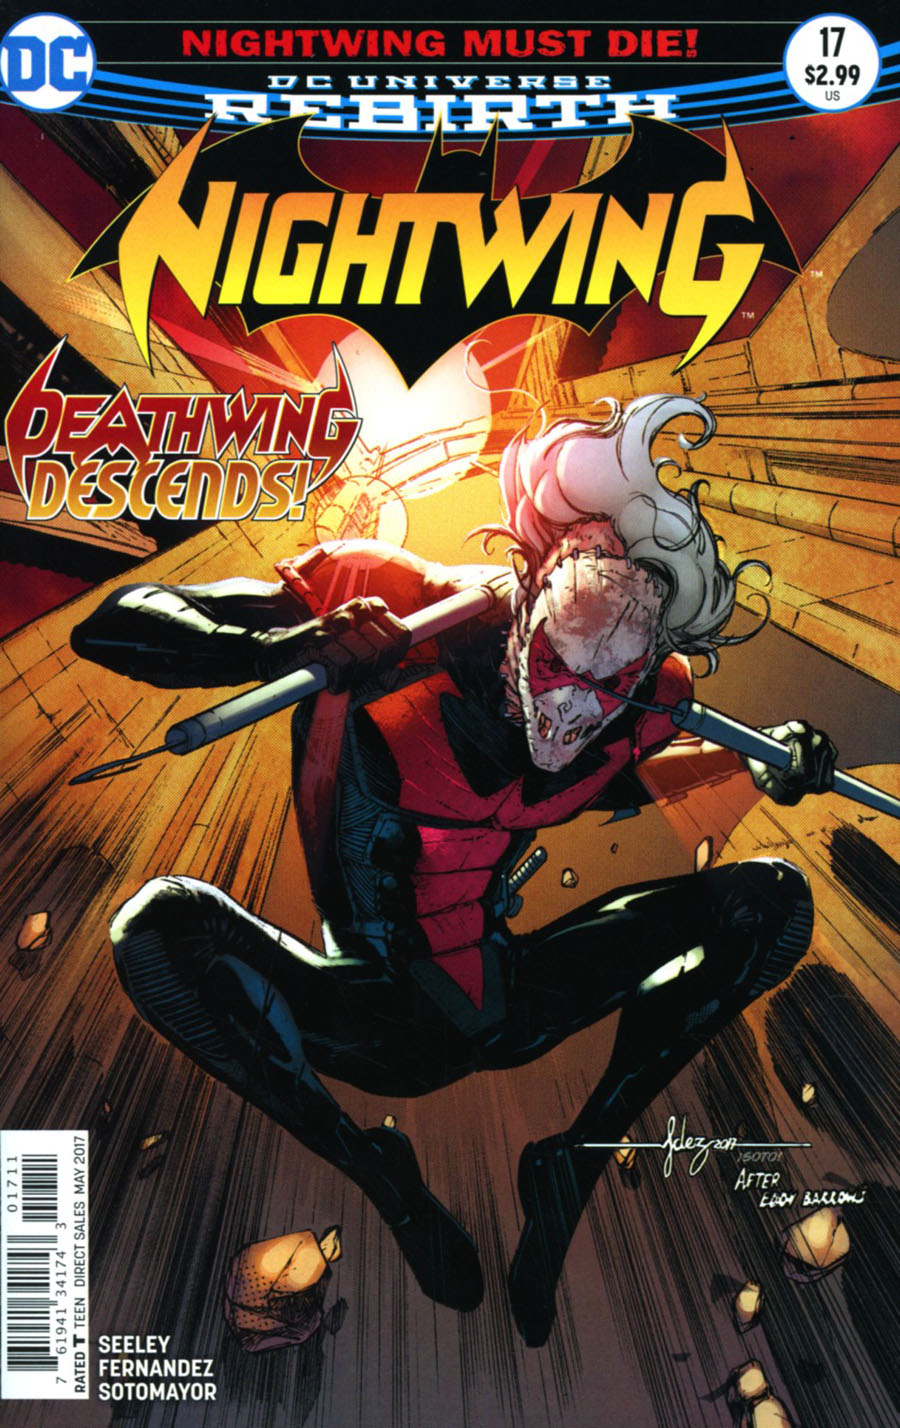 Nightwing Vol 4 #17 Cover A Regular Javier Fernandez Cover